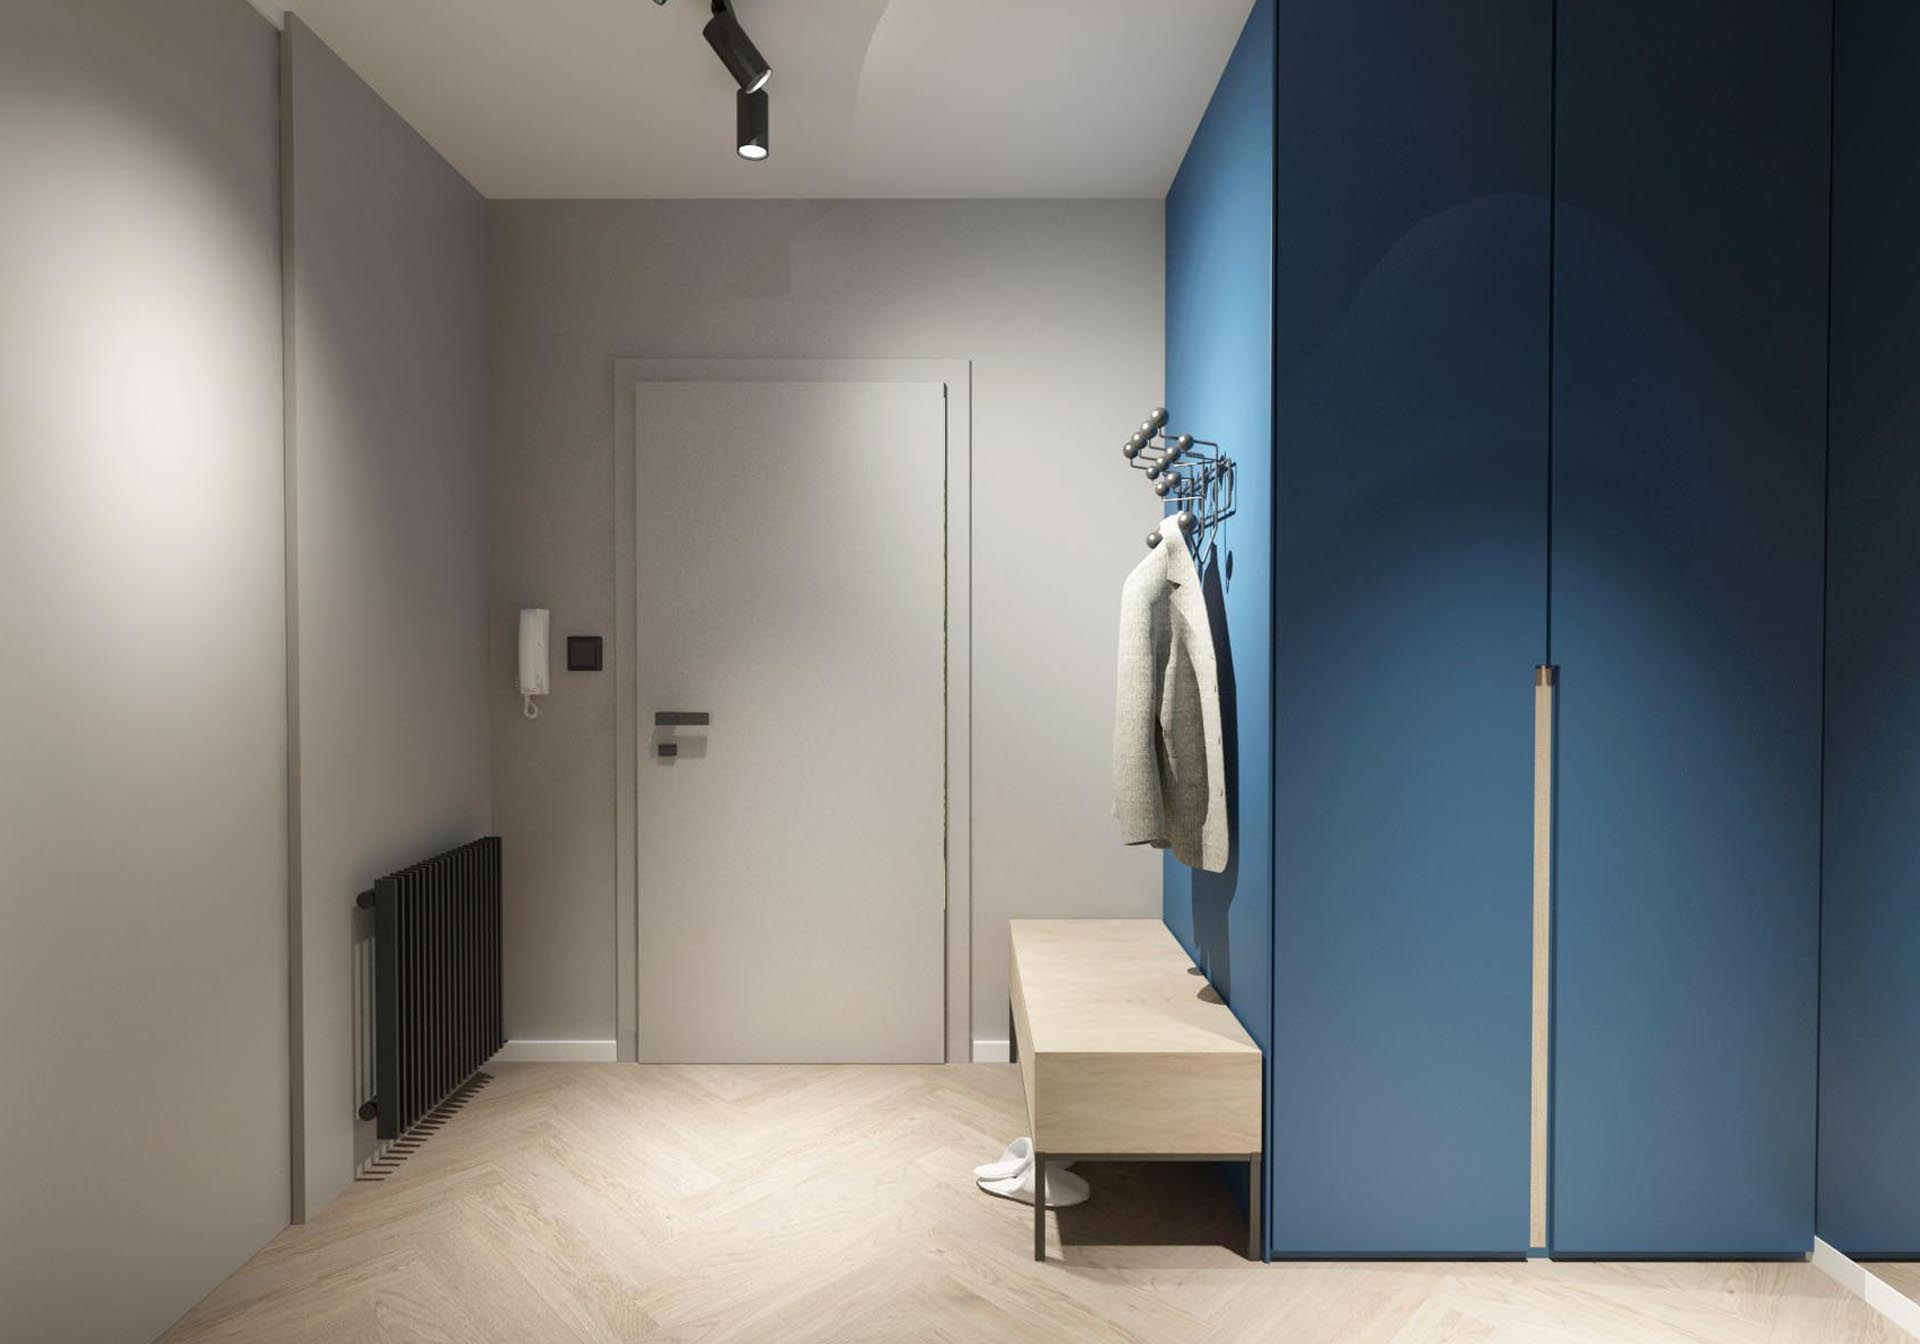 rekonstrukcia bytu, rekonstrukcia bytu bratislava, navrh vstupnej haly, navrh interieru, navrh vstupnej chodby, interierovy dizajn, interierovy dizajner, veronika paluchova, grey interior, black interior, blue, herringbone, oak parkett